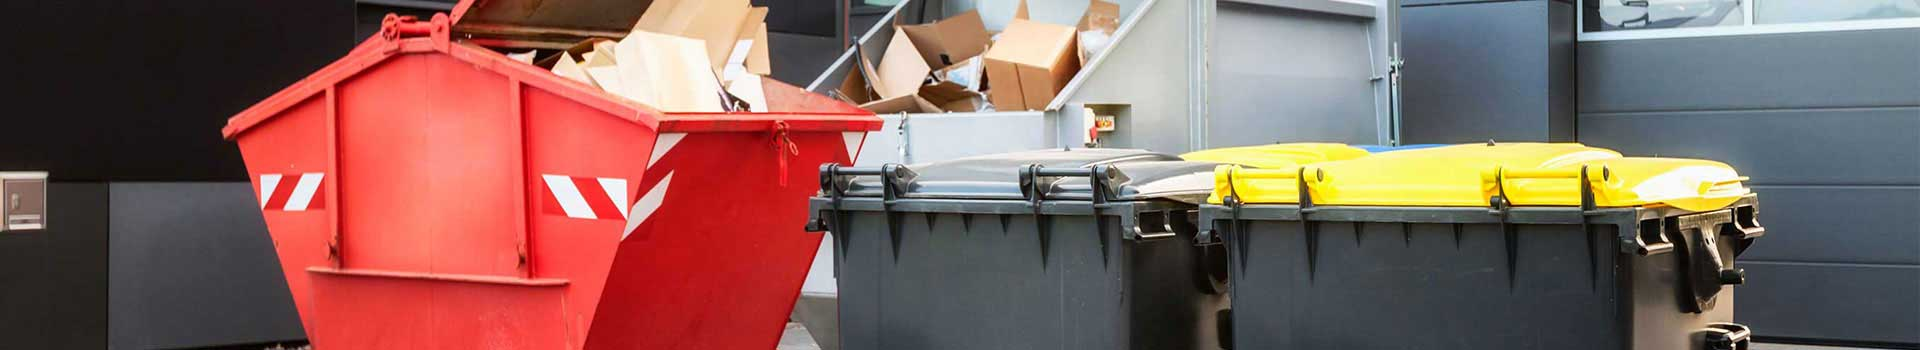 Waste Management in Blackburn